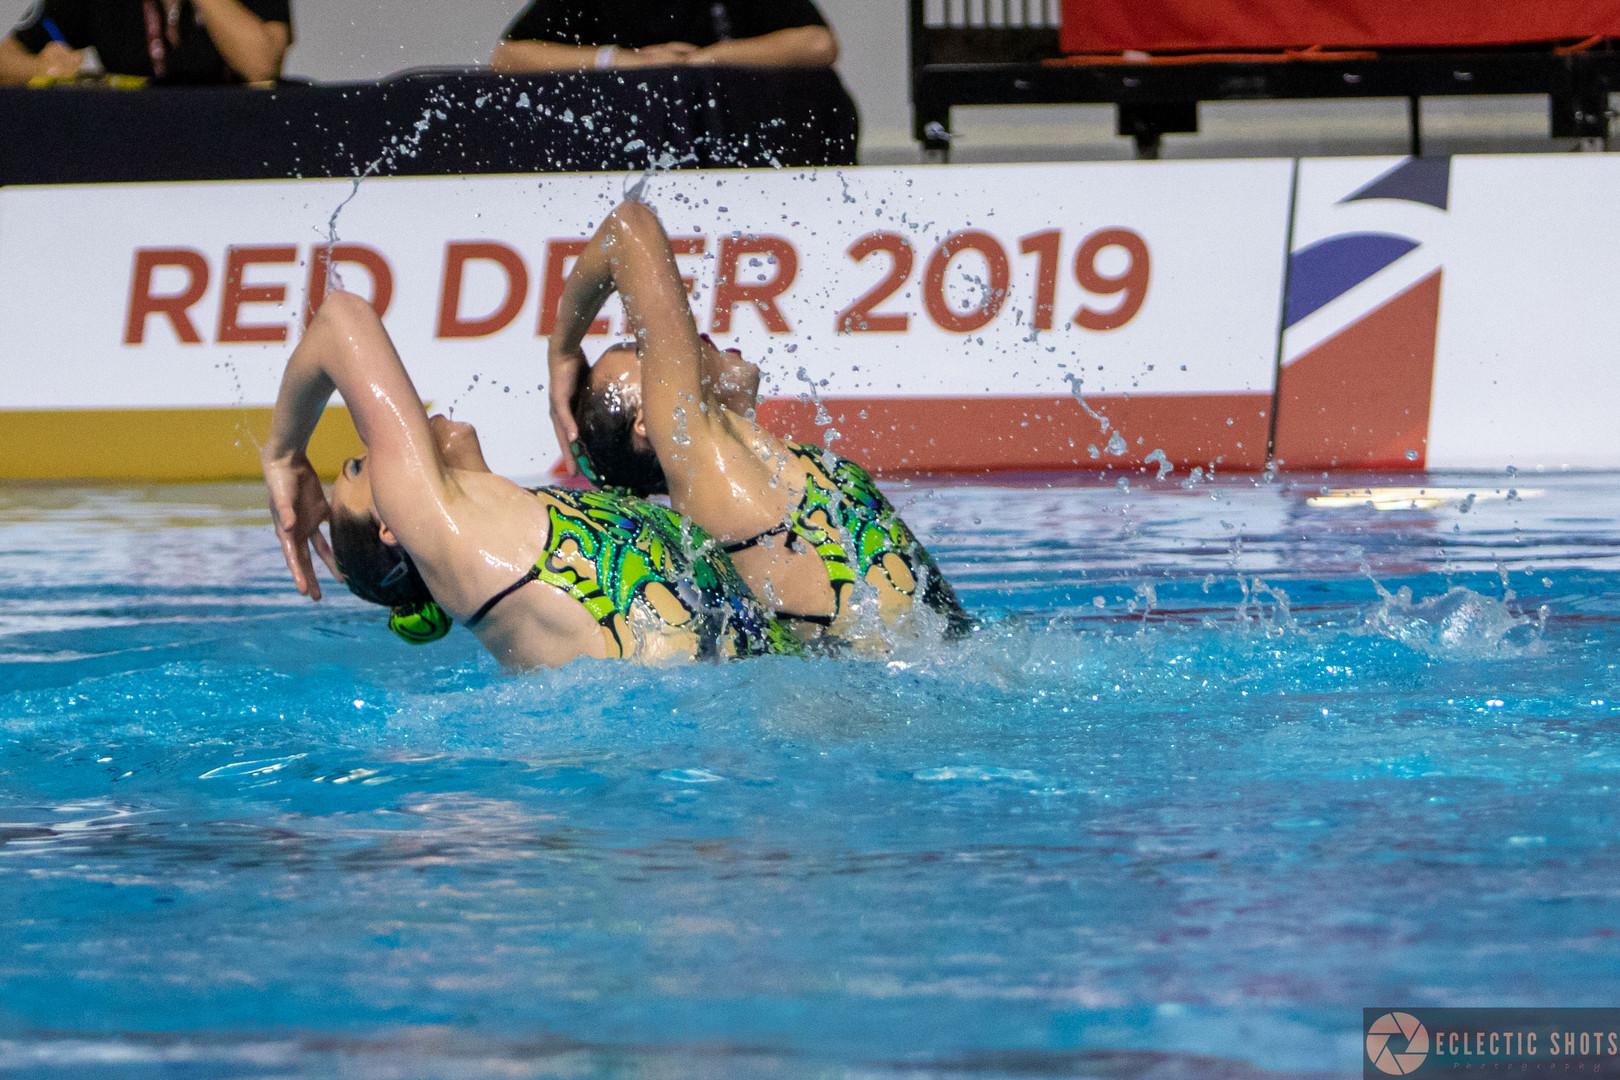 Artisitc Swimming-8950.jpg